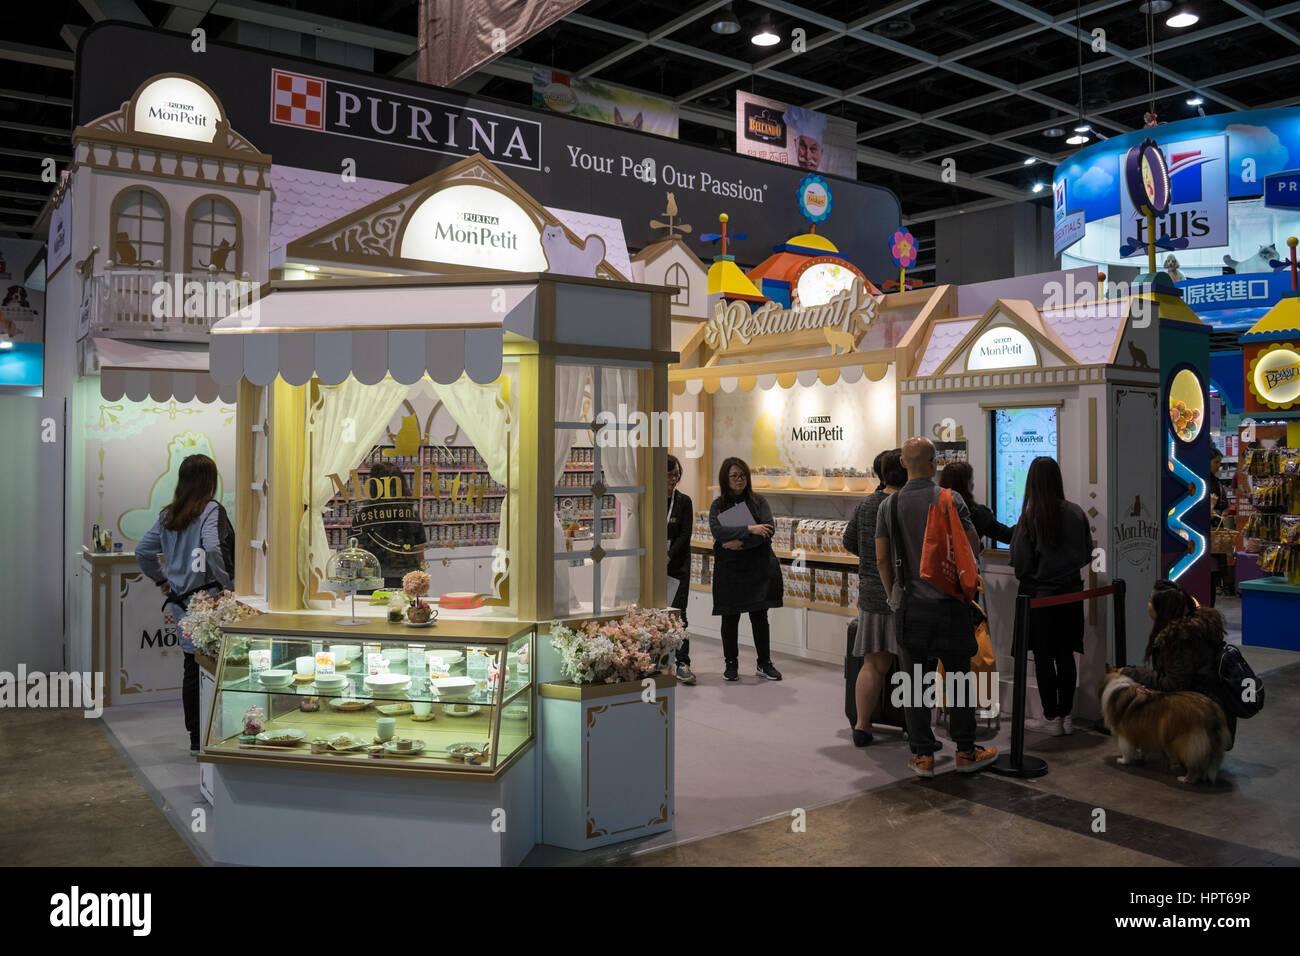 Exhibition Booth Rental Hong Kong : Pet food exhibition booth stock photos